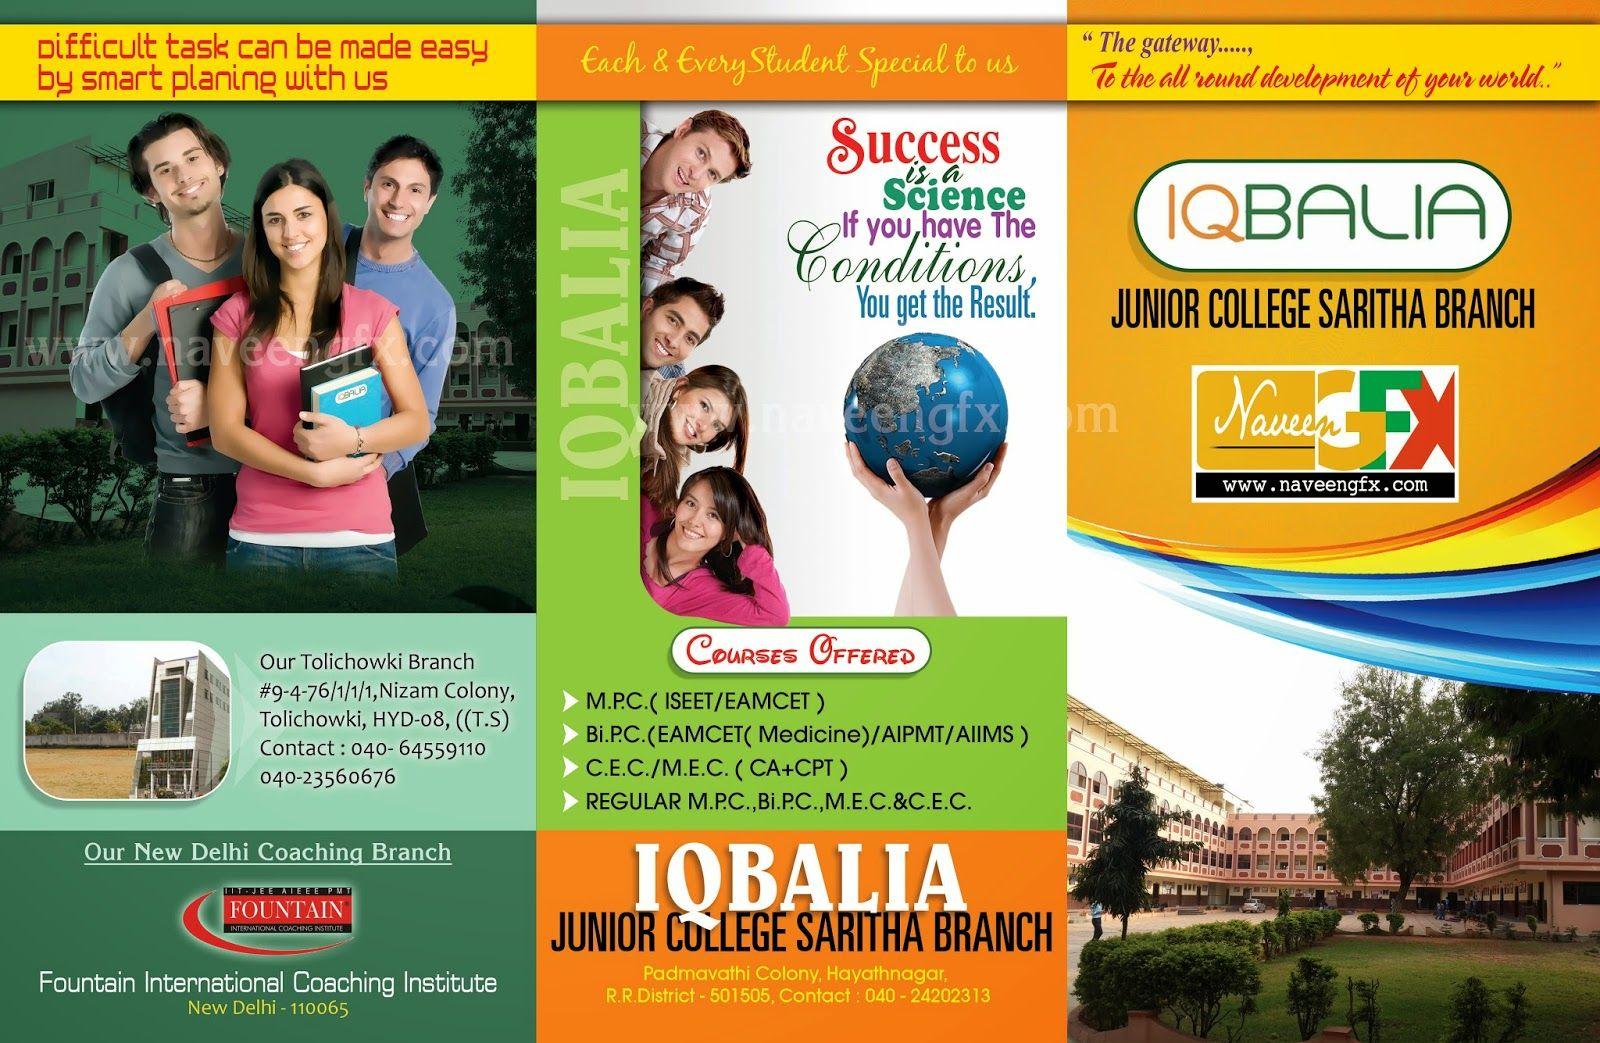 NaveenGFX Iqbalia Brochure design brochures – College Brochure